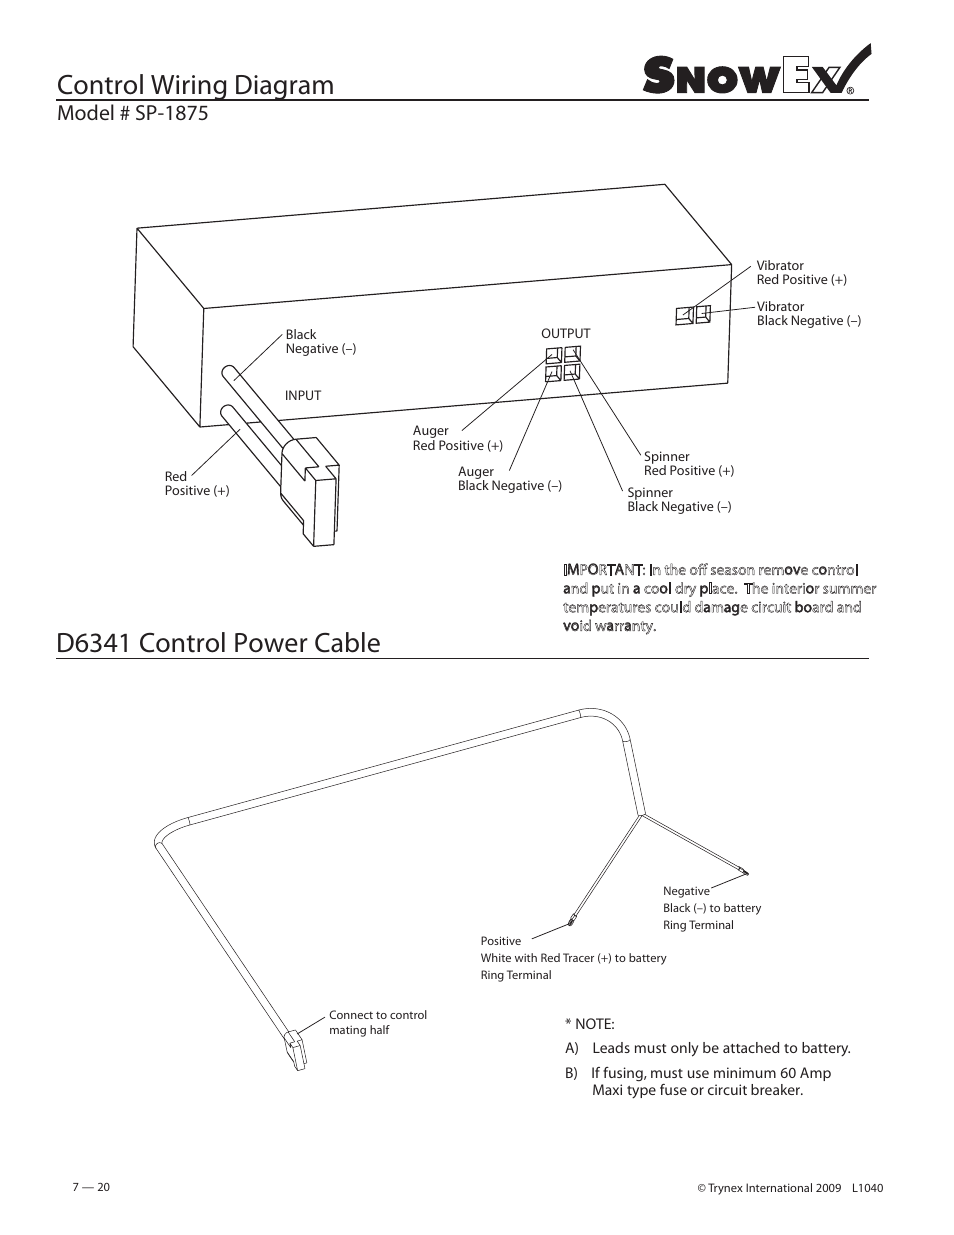 medium resolution of control wiring diagram d6341 control power cable model sp 1875 snowex